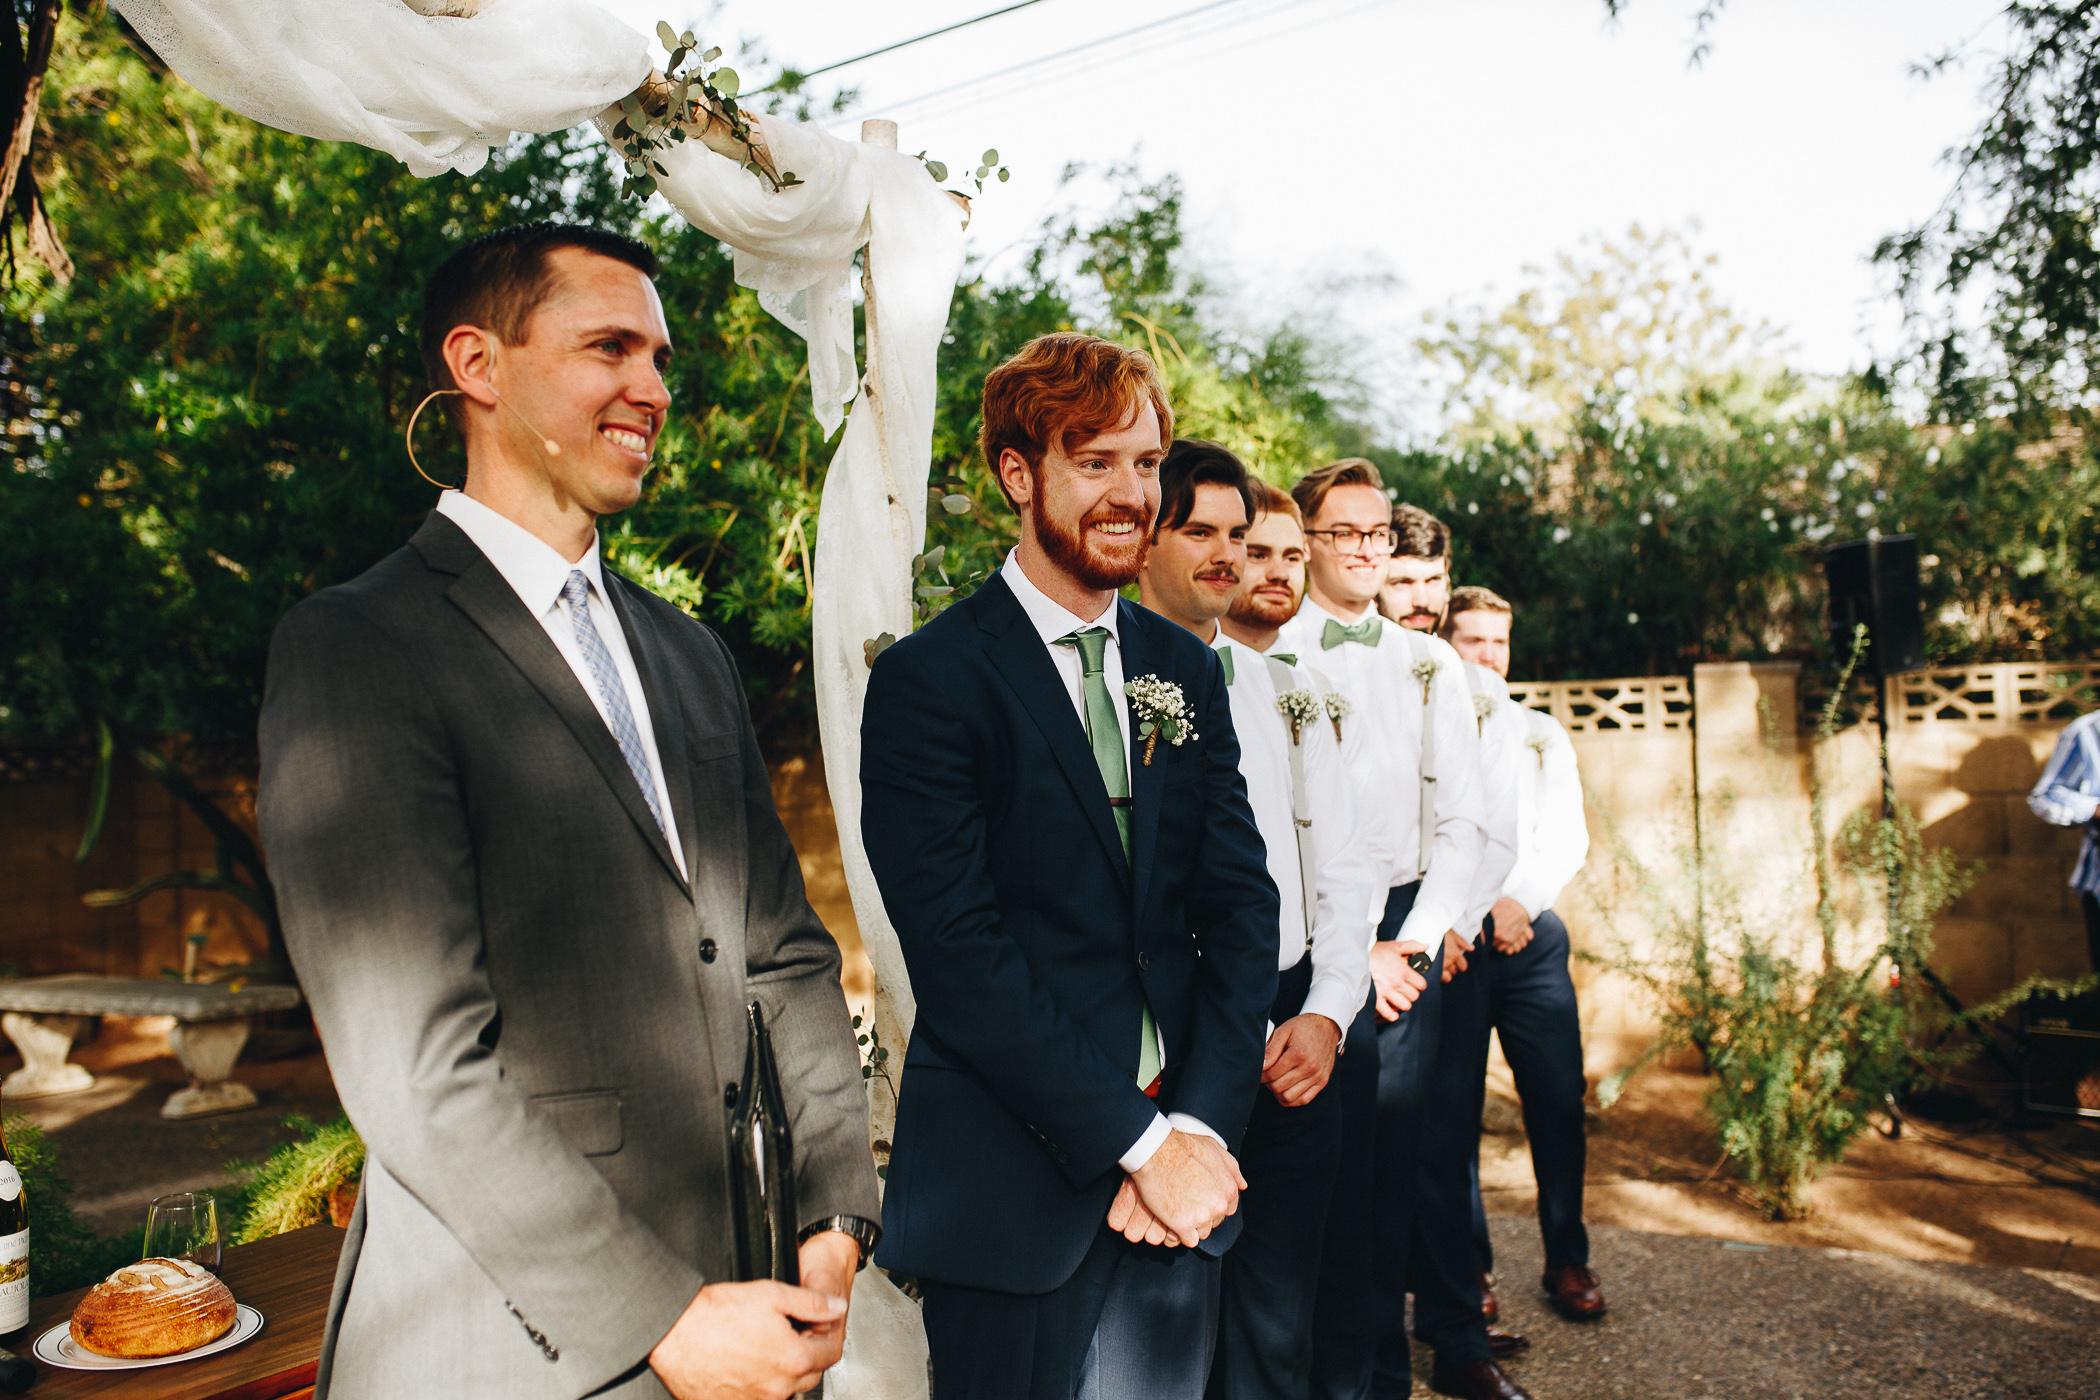 181104-Luxium-Weddings-Arizona-@matt__Le-Brandon-Kariana-Phoenix-Valley-Garden-Center-1051.jpg